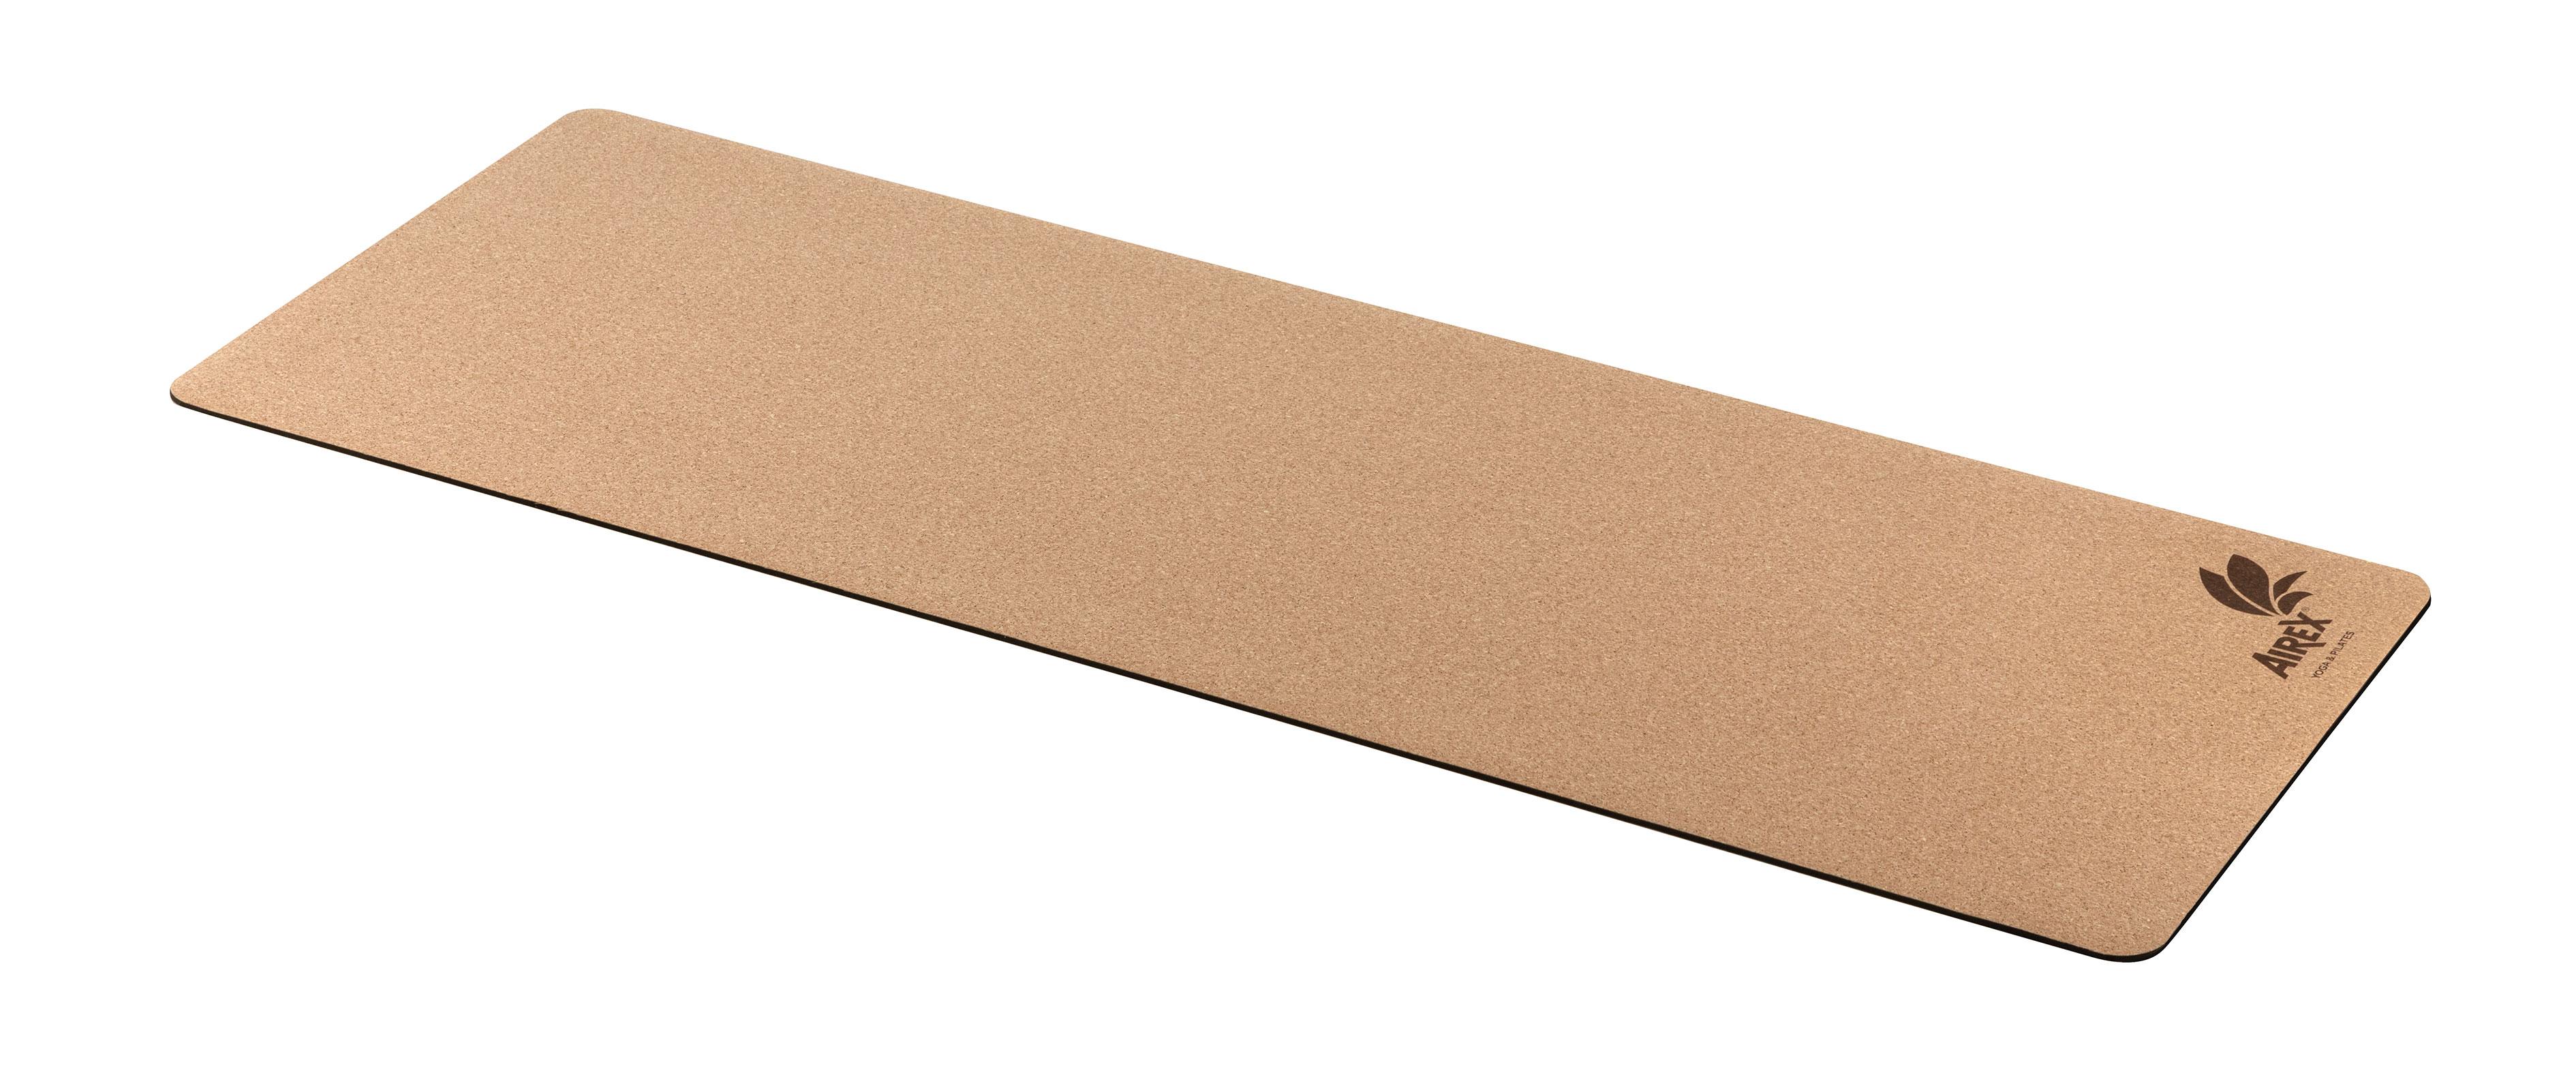 Yoga Eco Cork mat